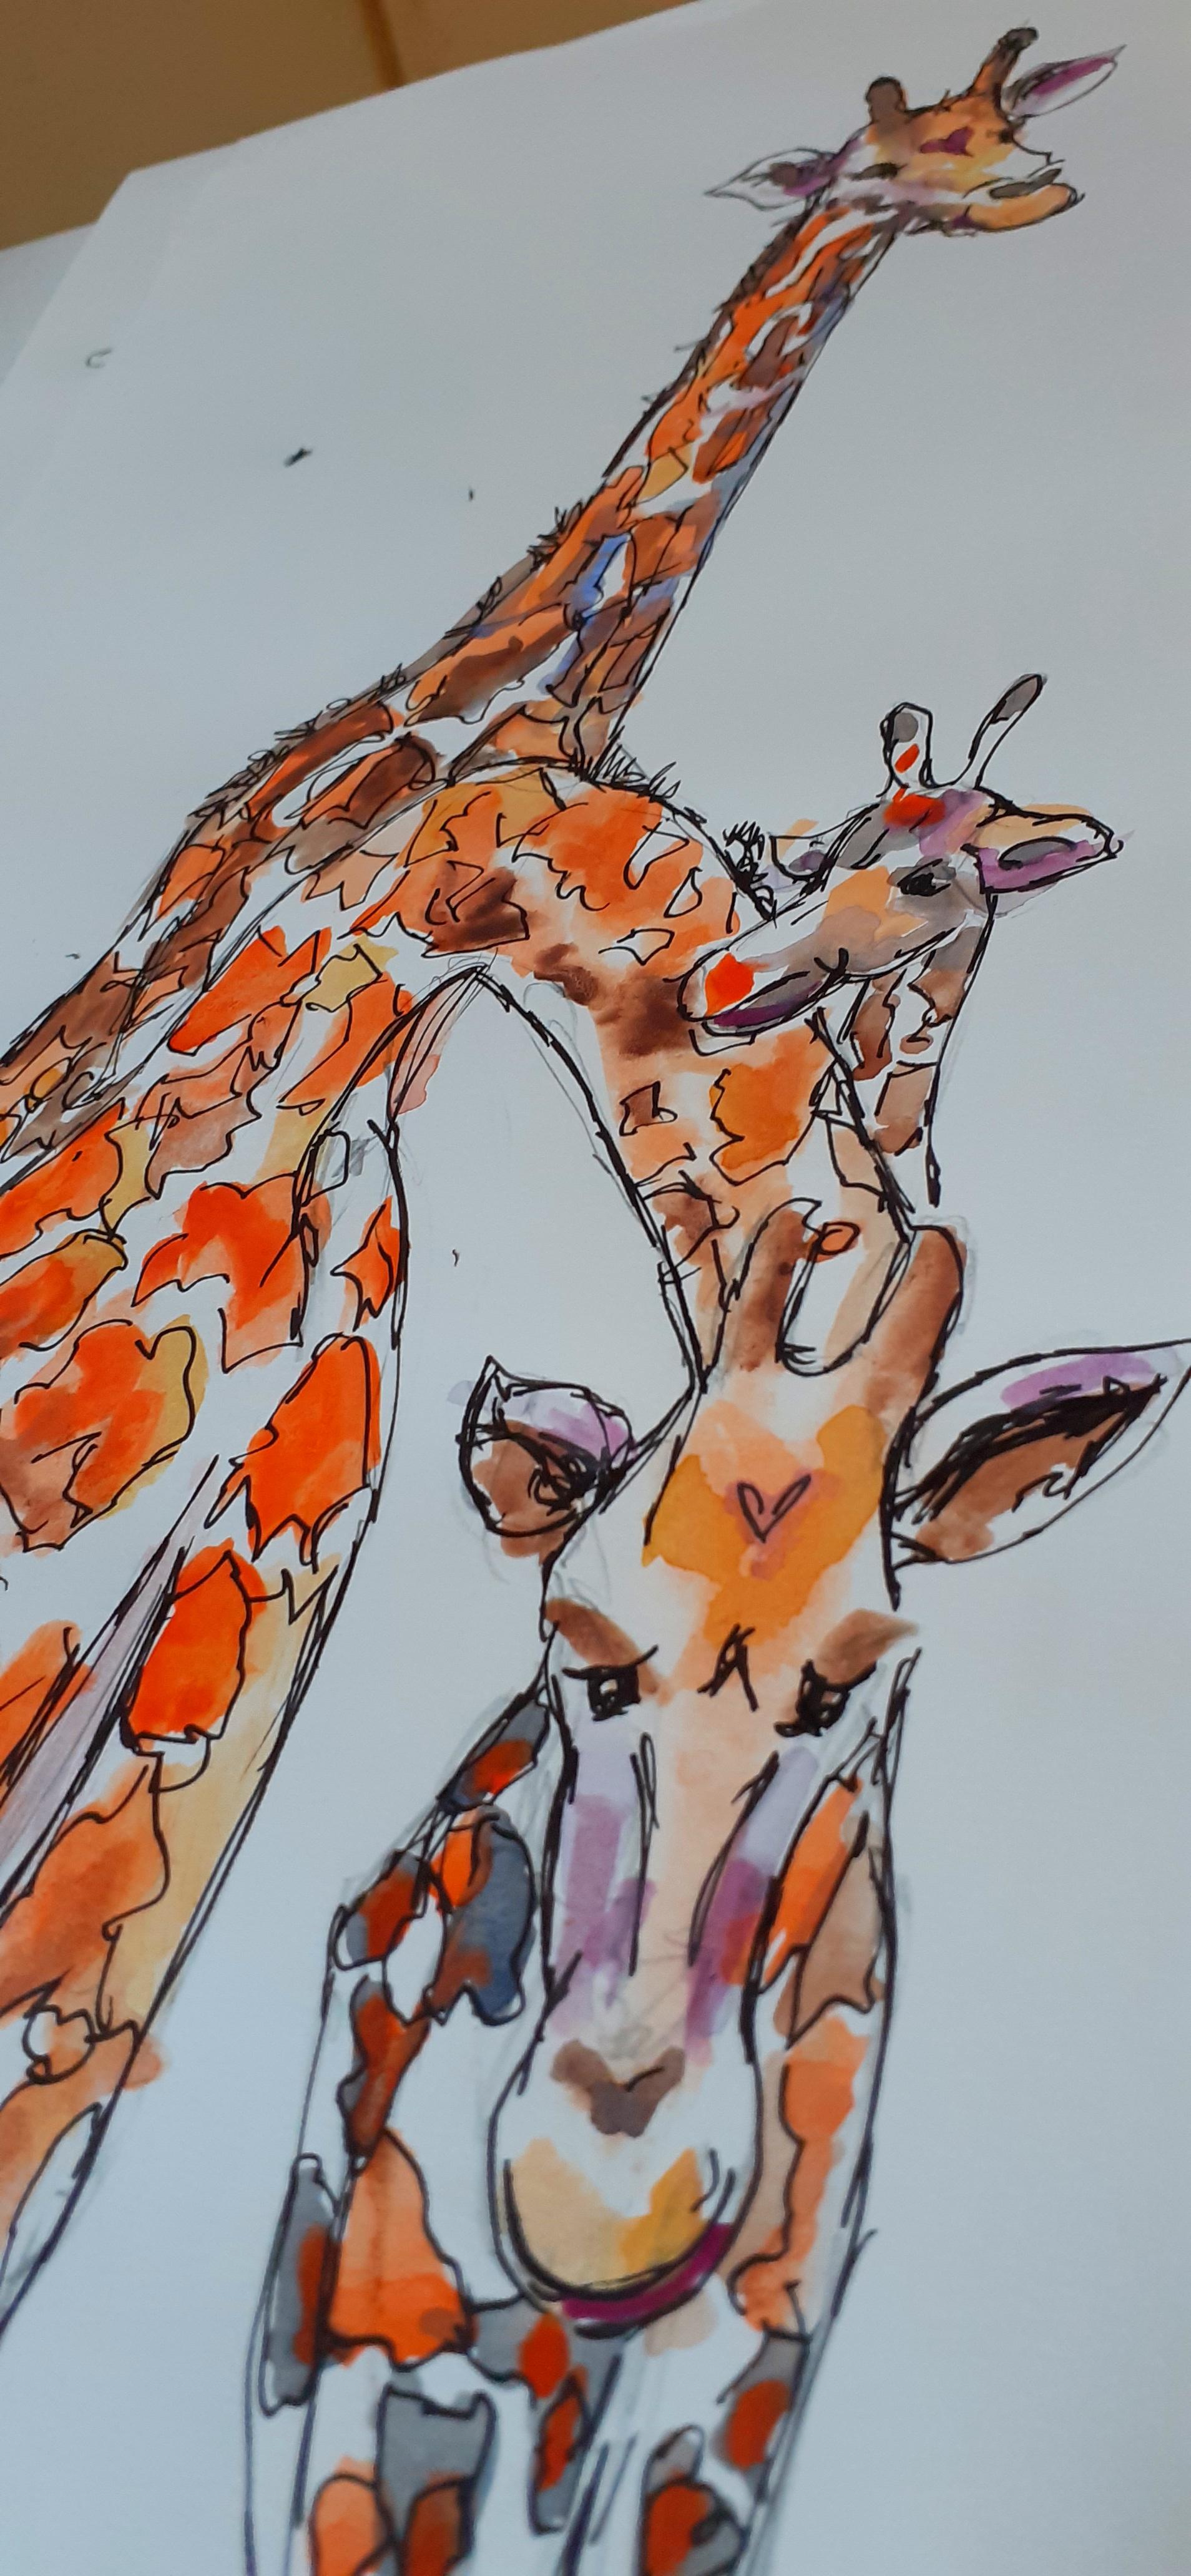 Giraffe & Co  - Sold